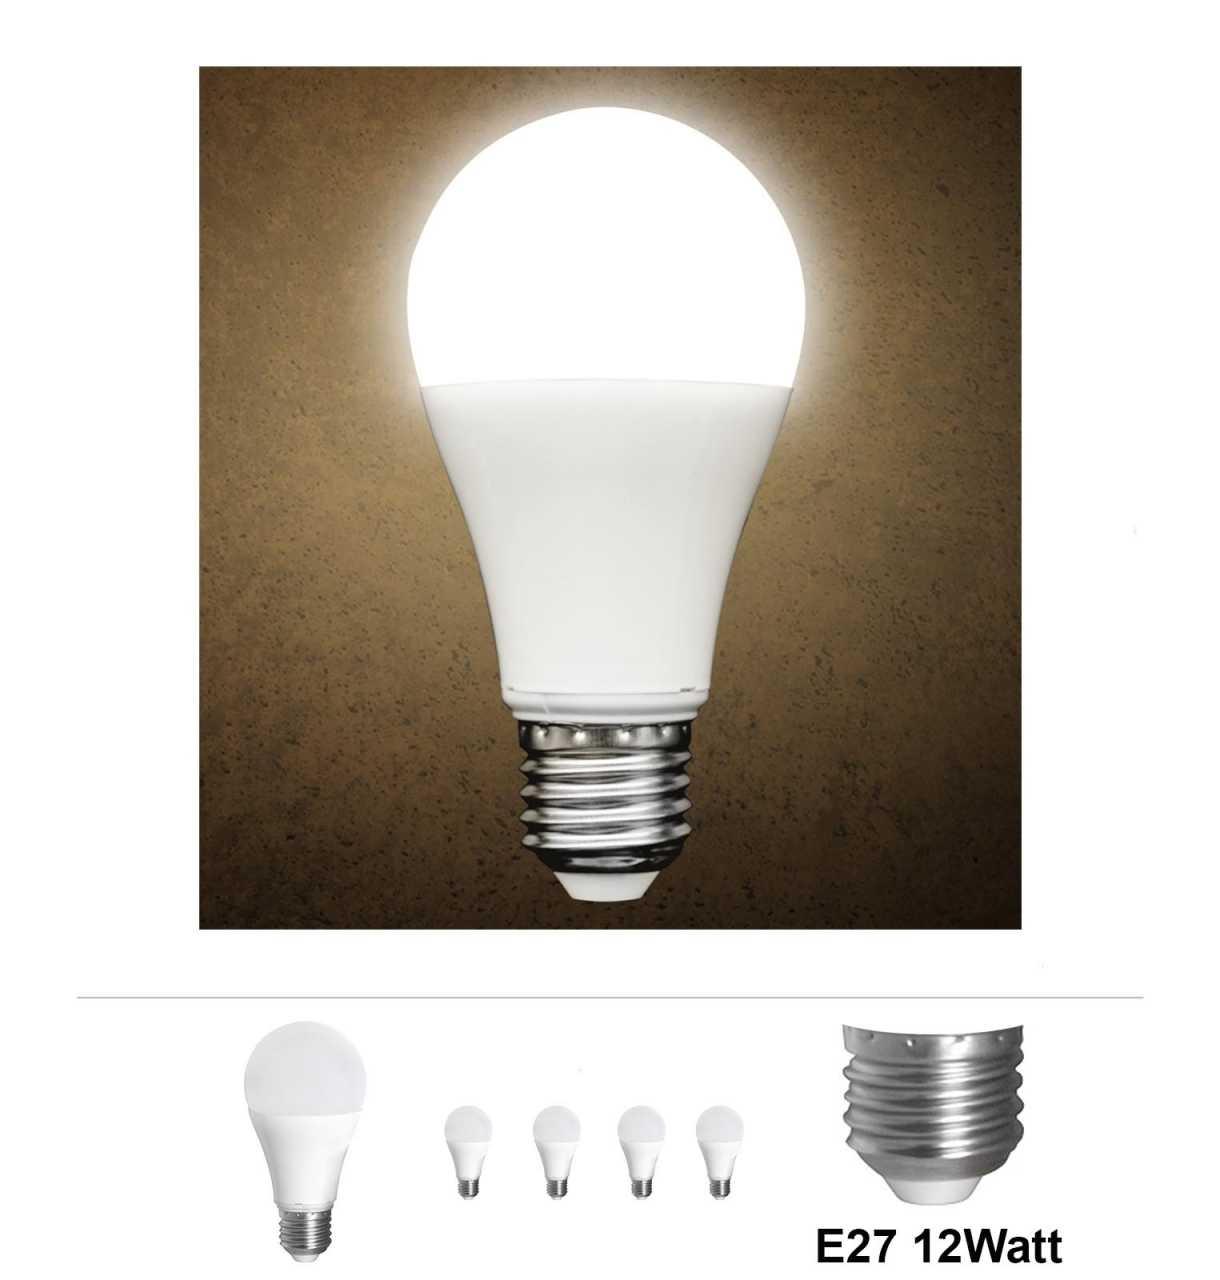 4x Grafner® LED Leuchtmittel E27 12 Watt 3000K Warmweiss